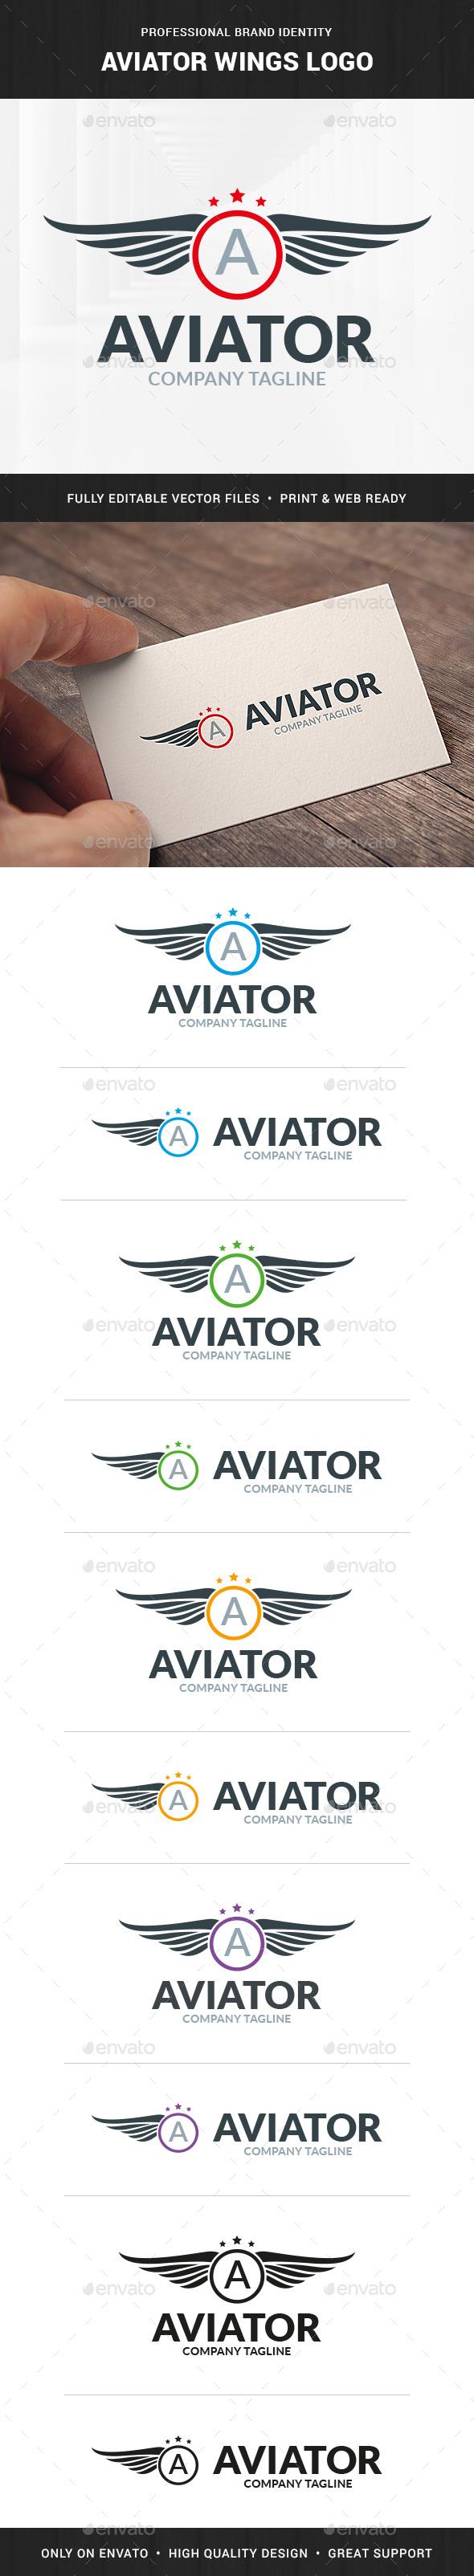 Aviator Wings Logo Template